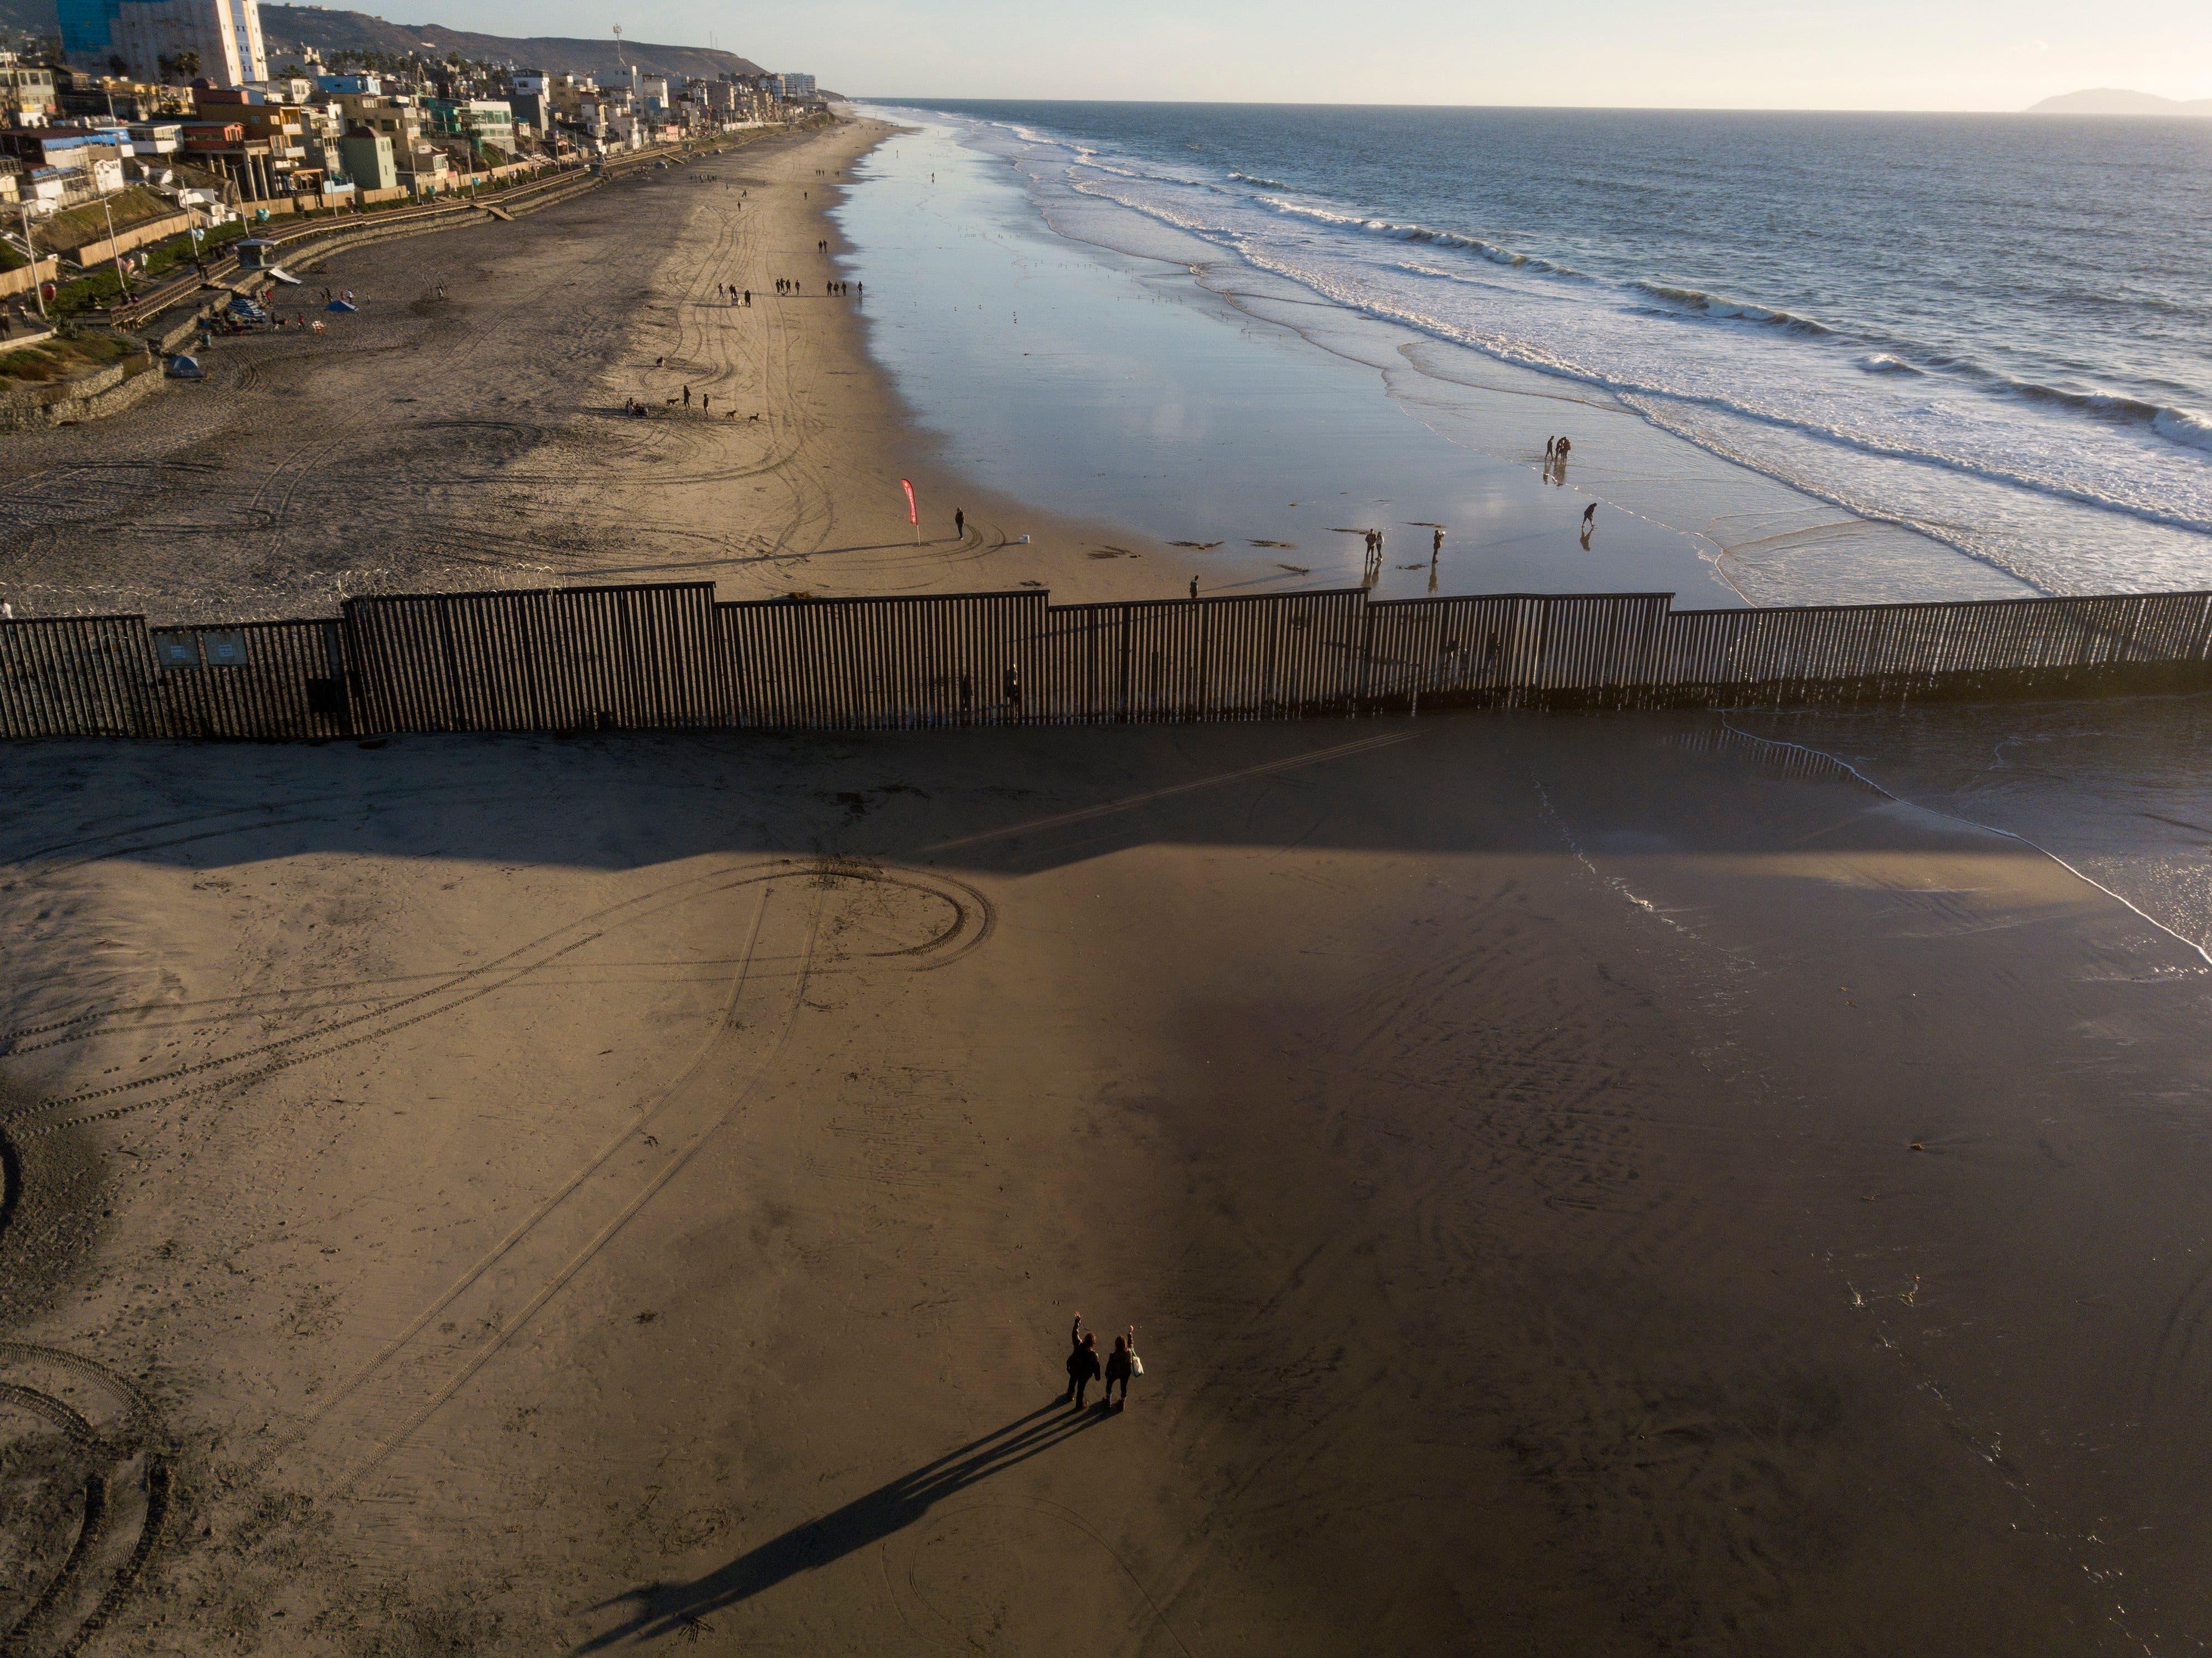 Corte Suprema de EEUU rechaza demanda contra muro fronterizo